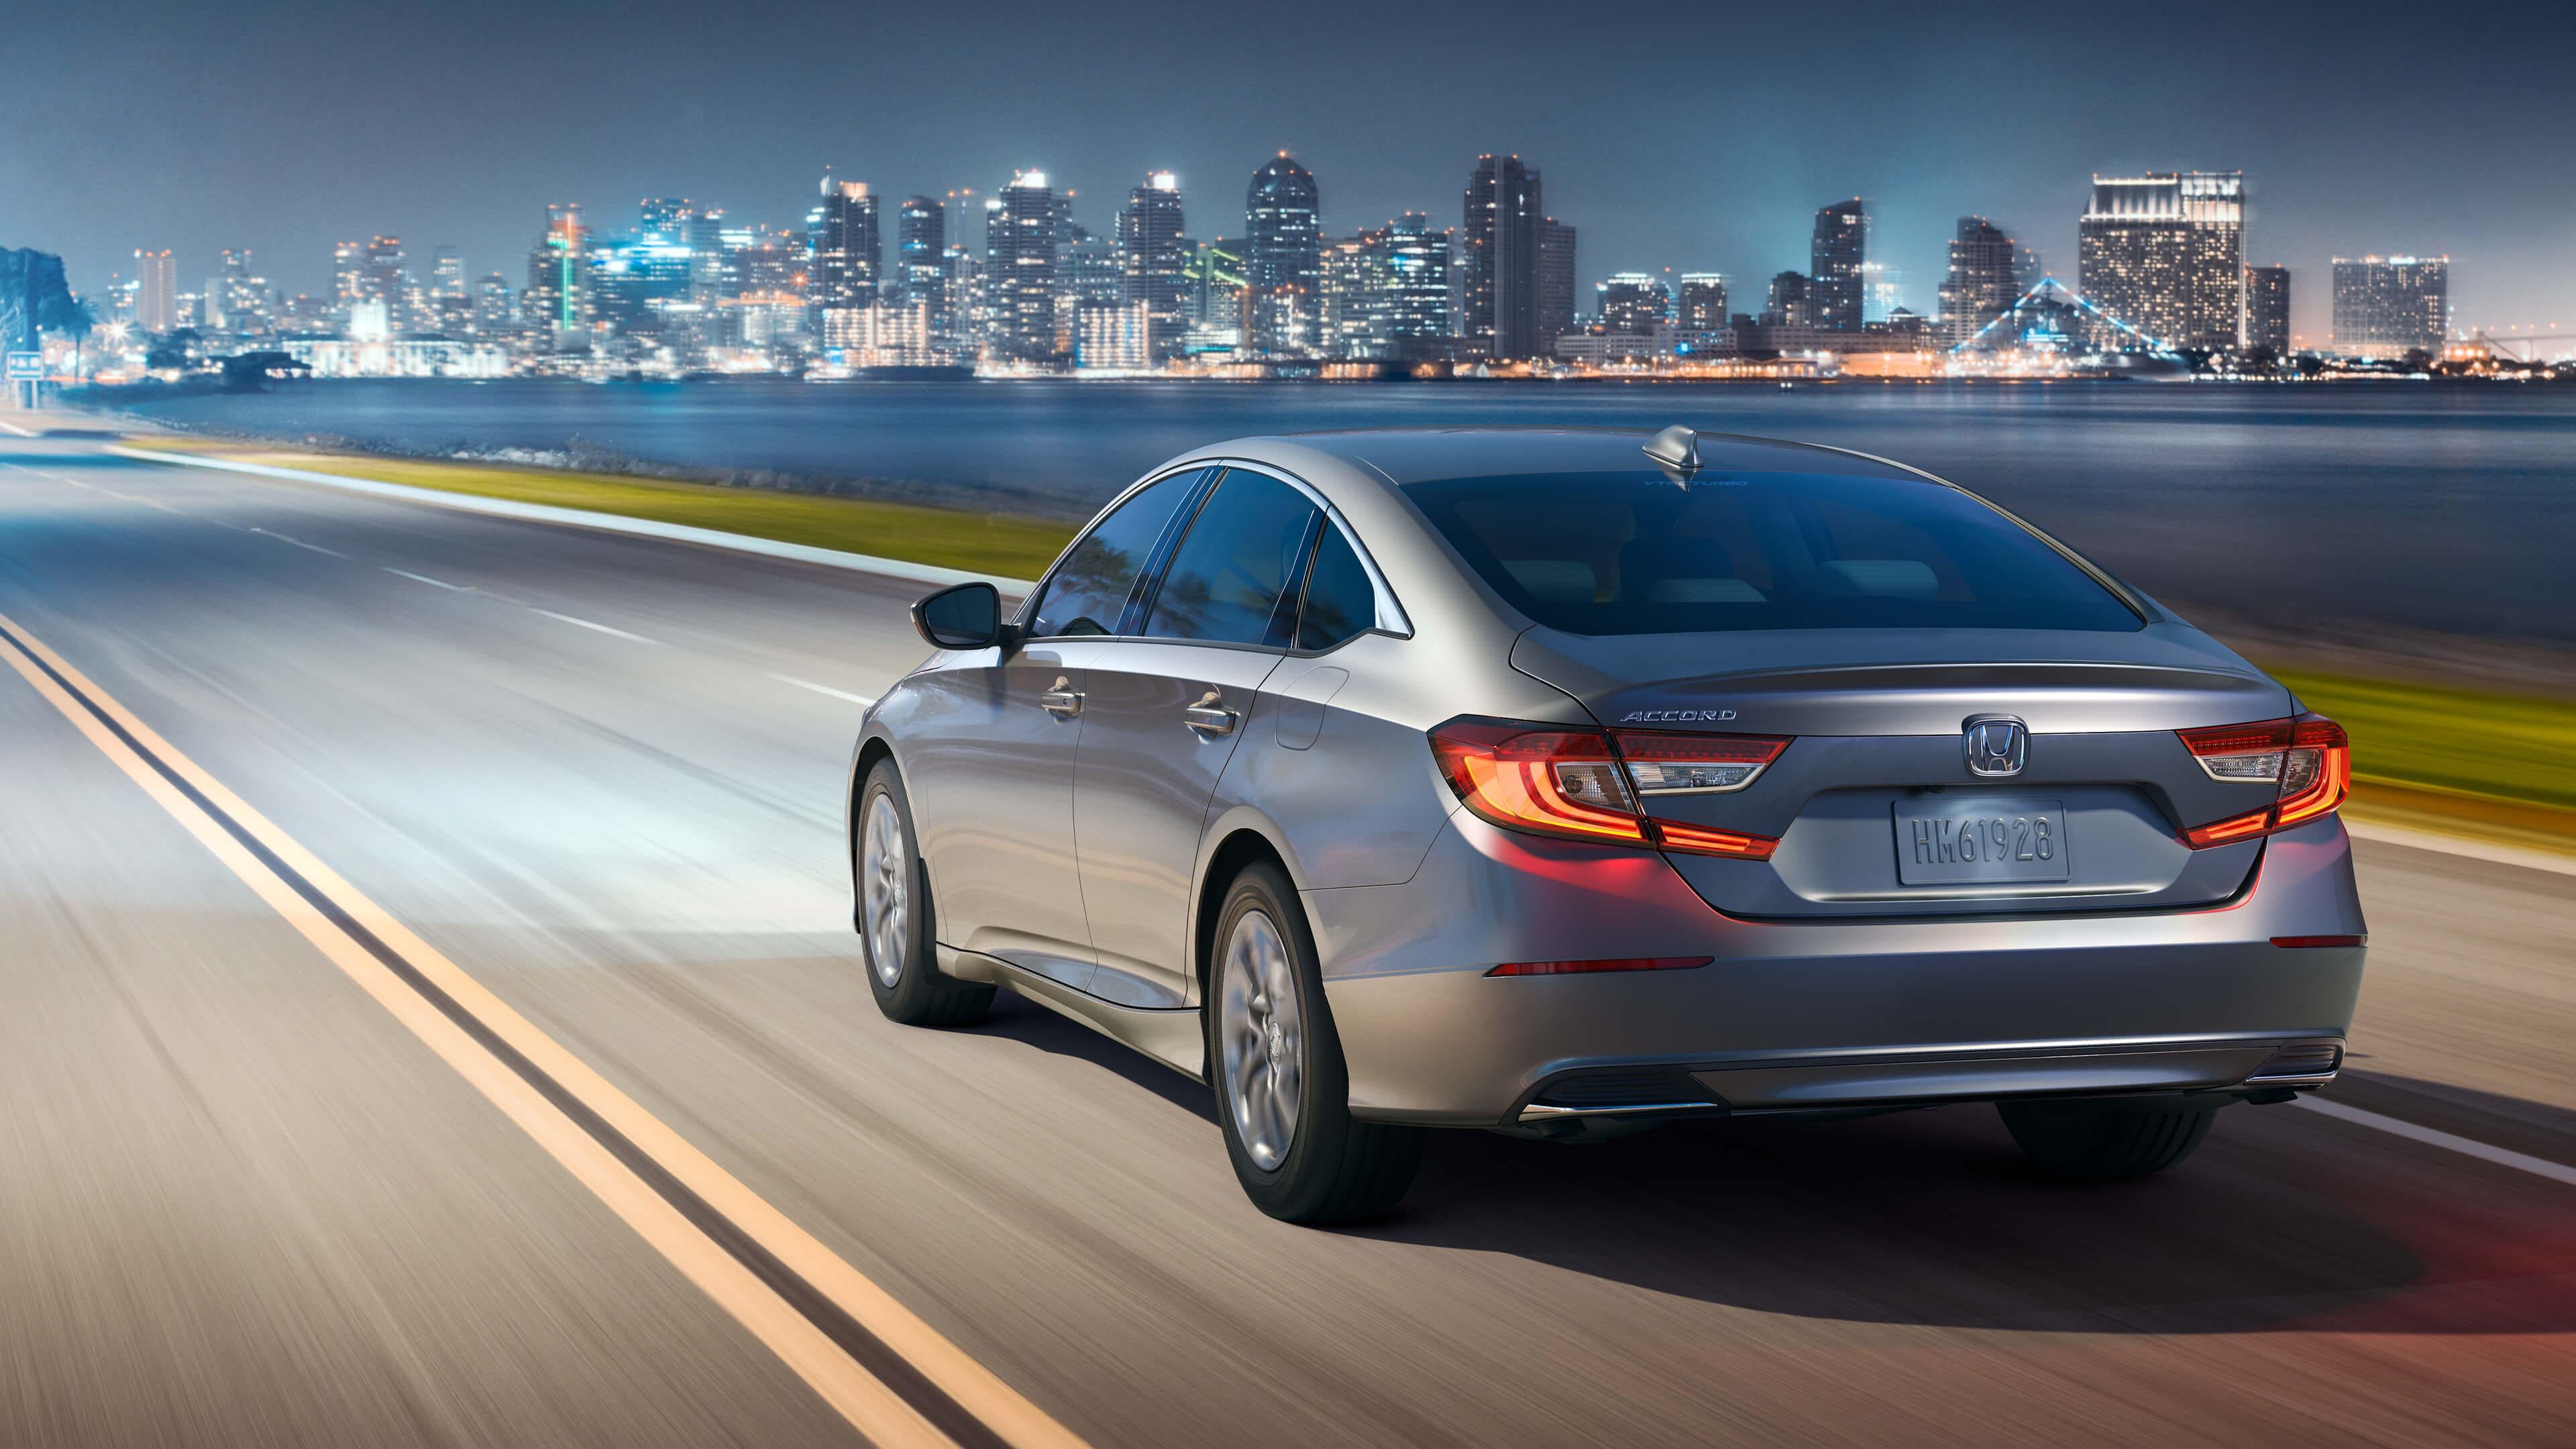 Honda Accord For Sale In Maple Ridge Bc